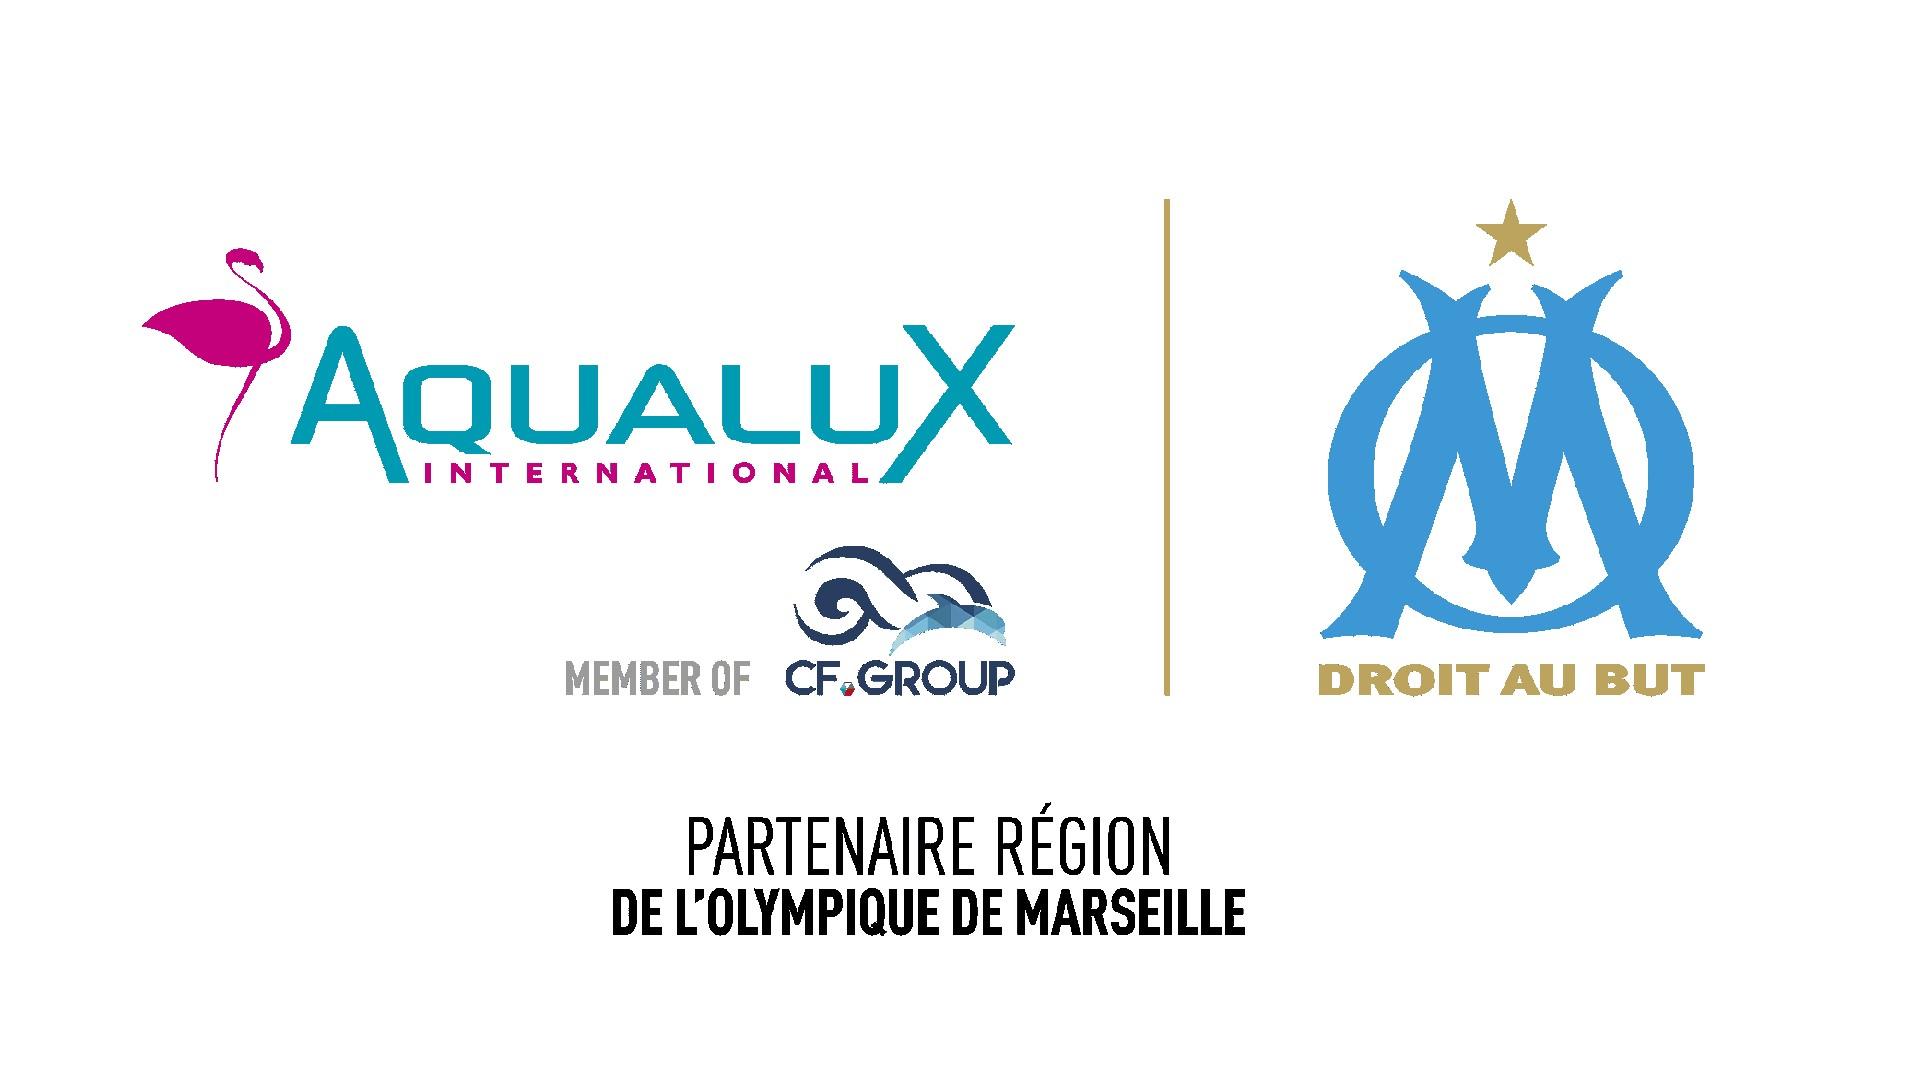 Aqualux x Olympique de Marseille (football) 2021